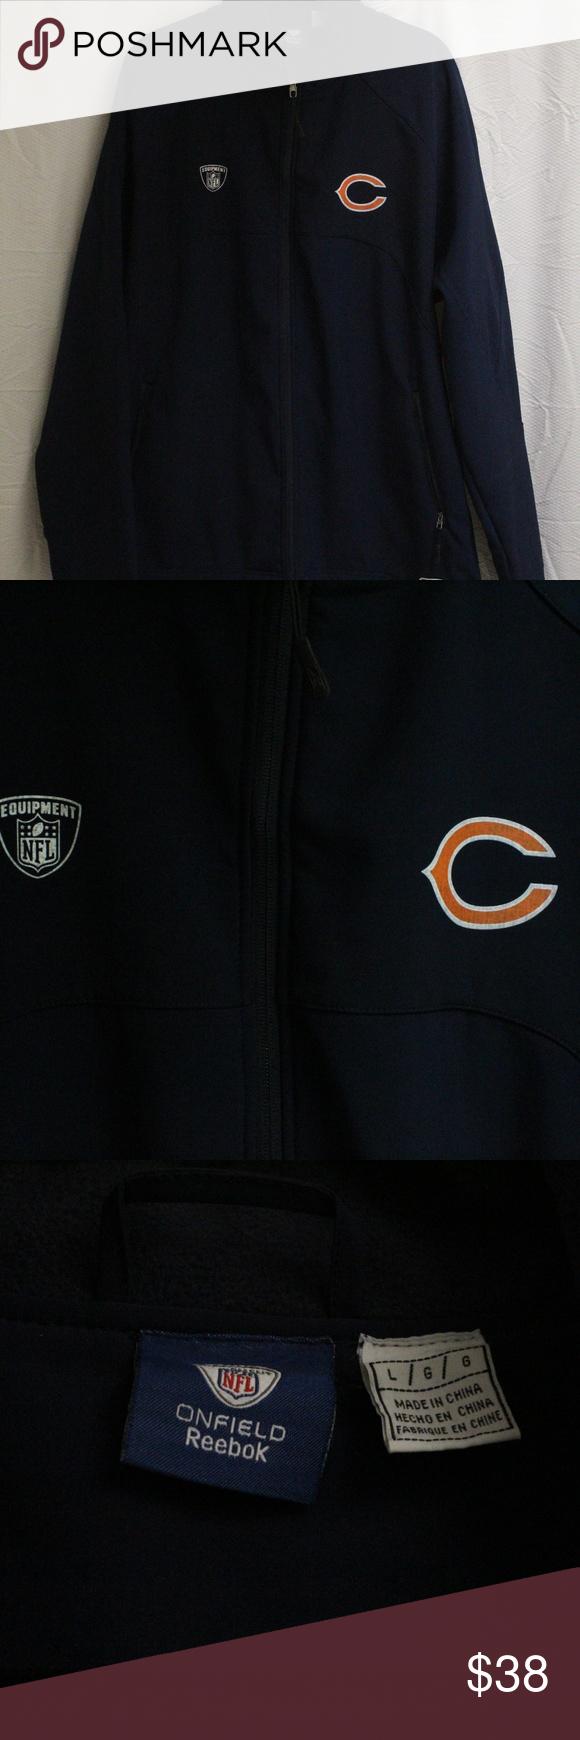 Reebok Jacket Reebok Chicago Bears Jacket Men S L But Runs Like An Xl In Excellent Condition Dark Blue Reebok Jackets Coats Jackets Bear Jacket Reebok [ 1740 x 580 Pixel ]